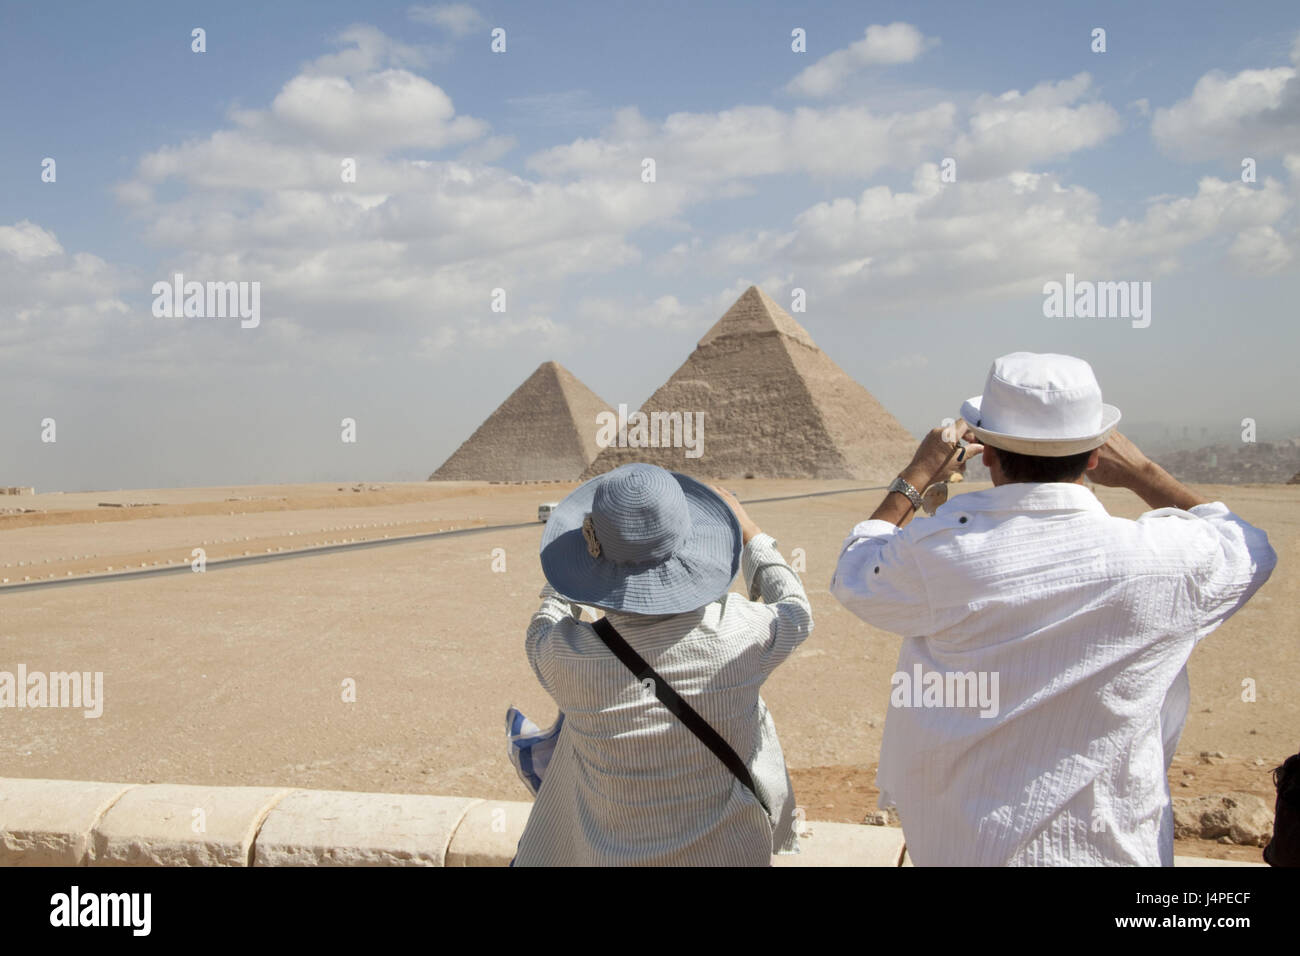 Egypt, tourist couple, take photos, pyramids, Cairo, person, couple, tourist, back view, solar hats, sunscreen, - Stock Image